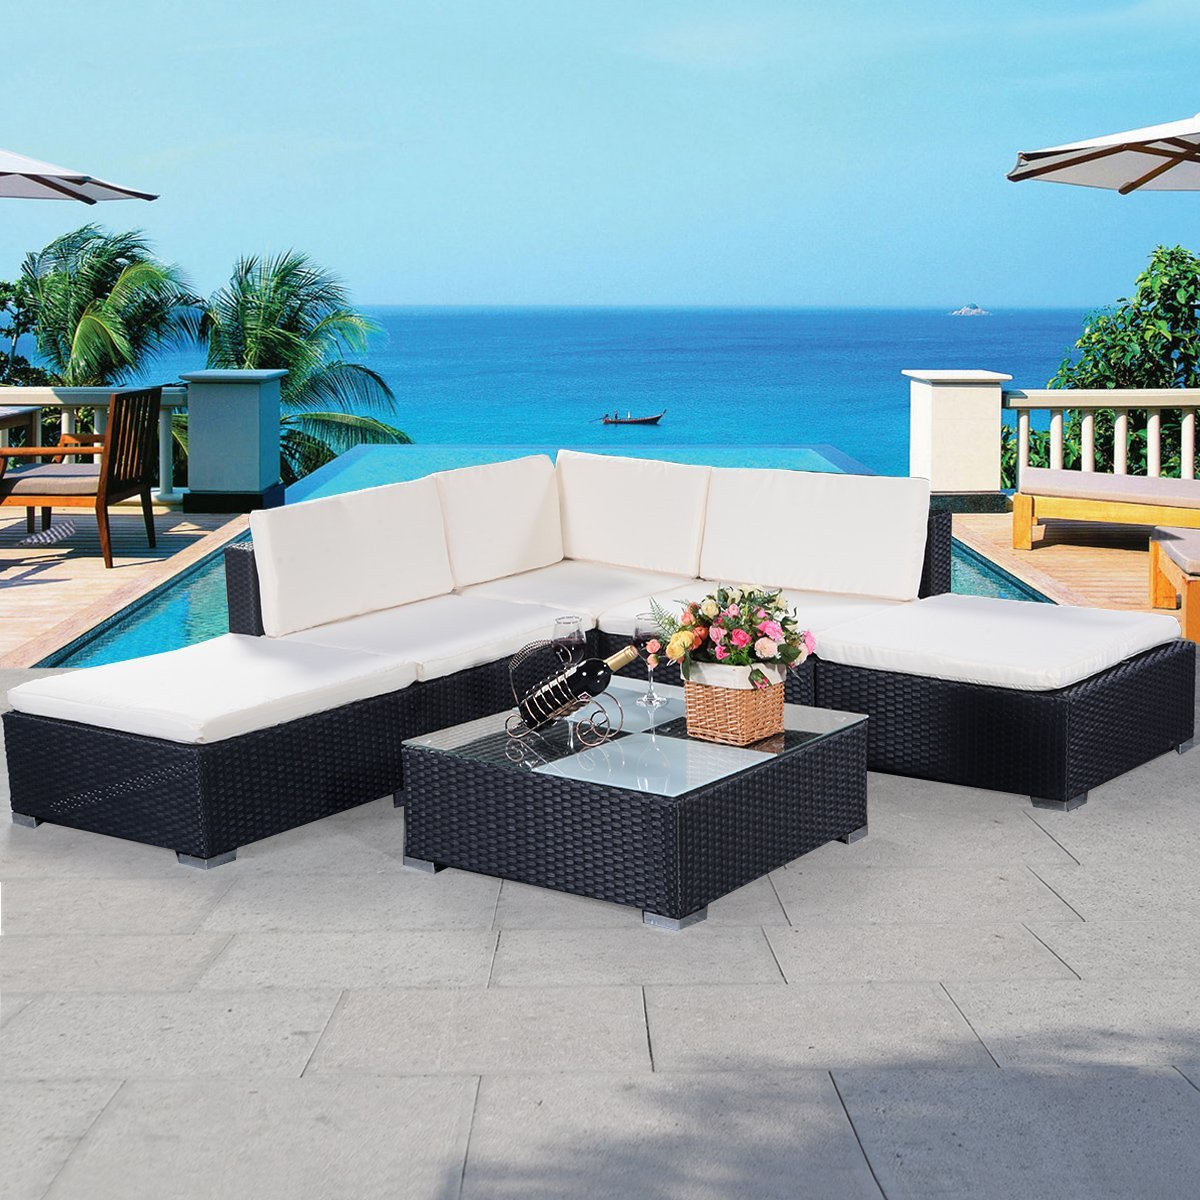 Amazon.de: COSTWAY Poly Rattan Rattanmöbel Gartenmöbel Lounge Set ...